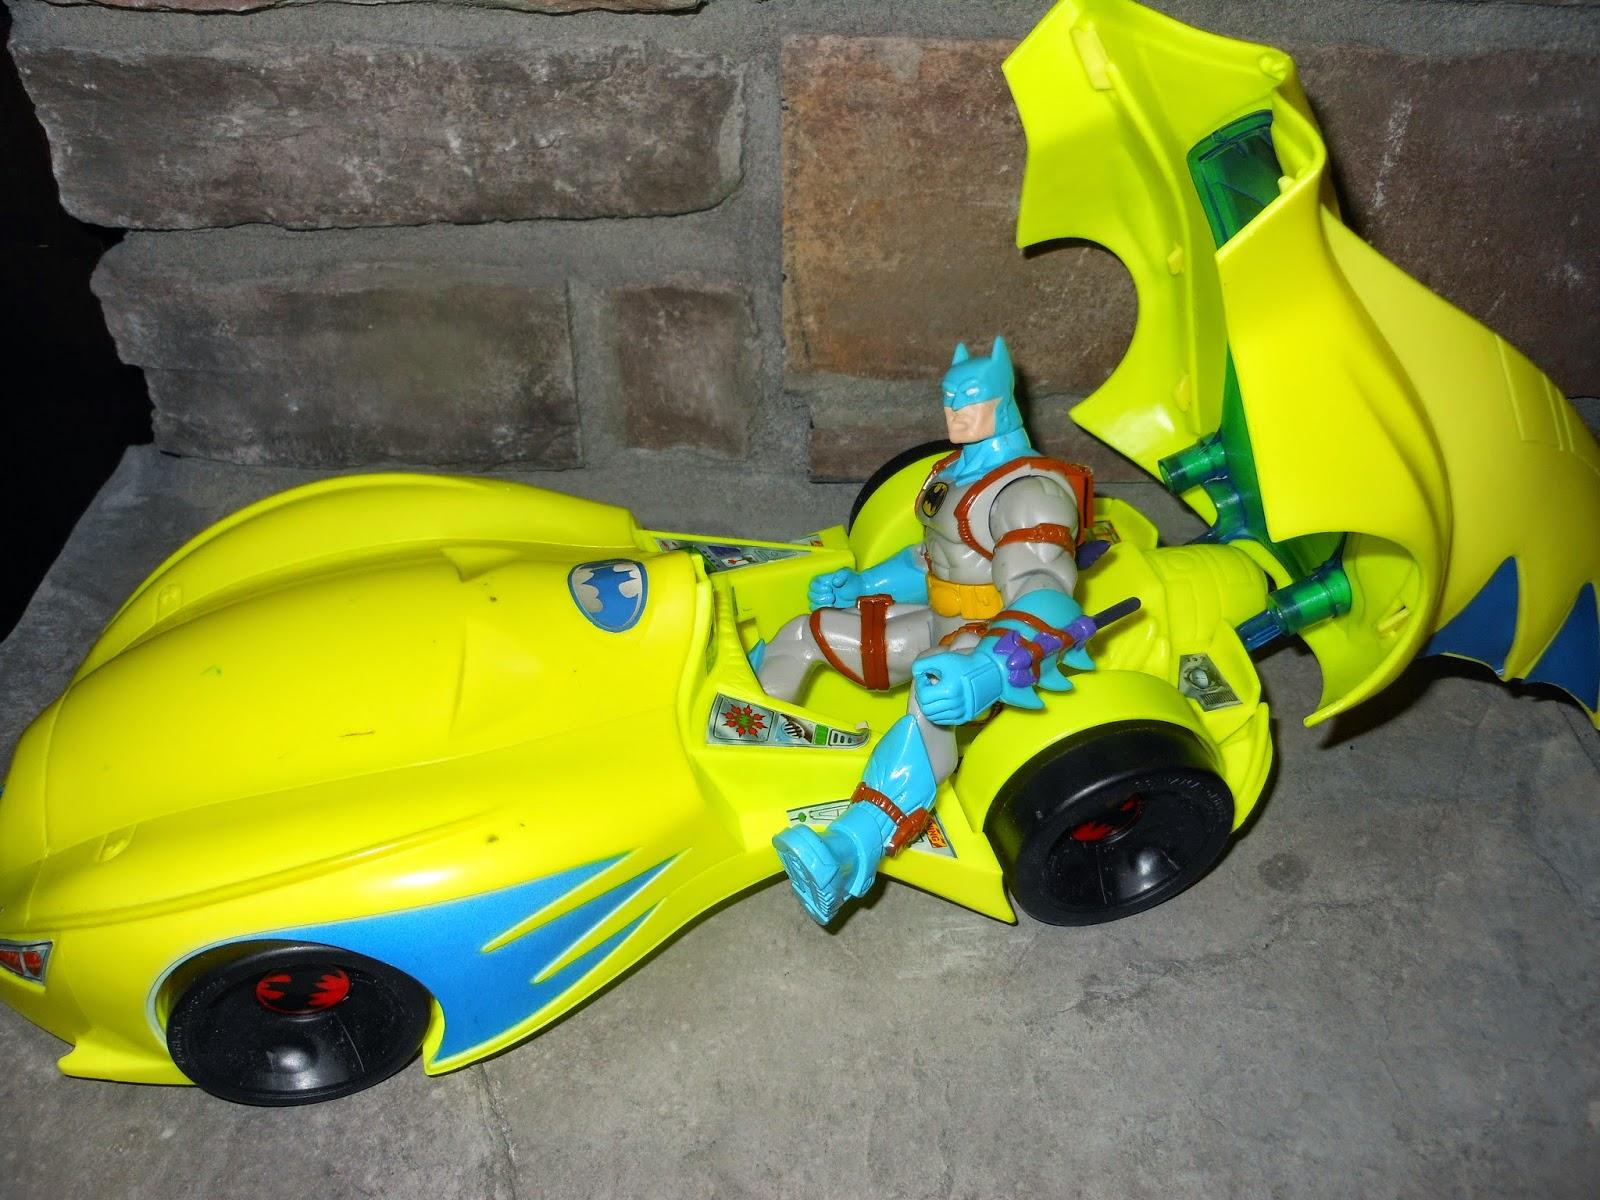 batmobile2.JPG